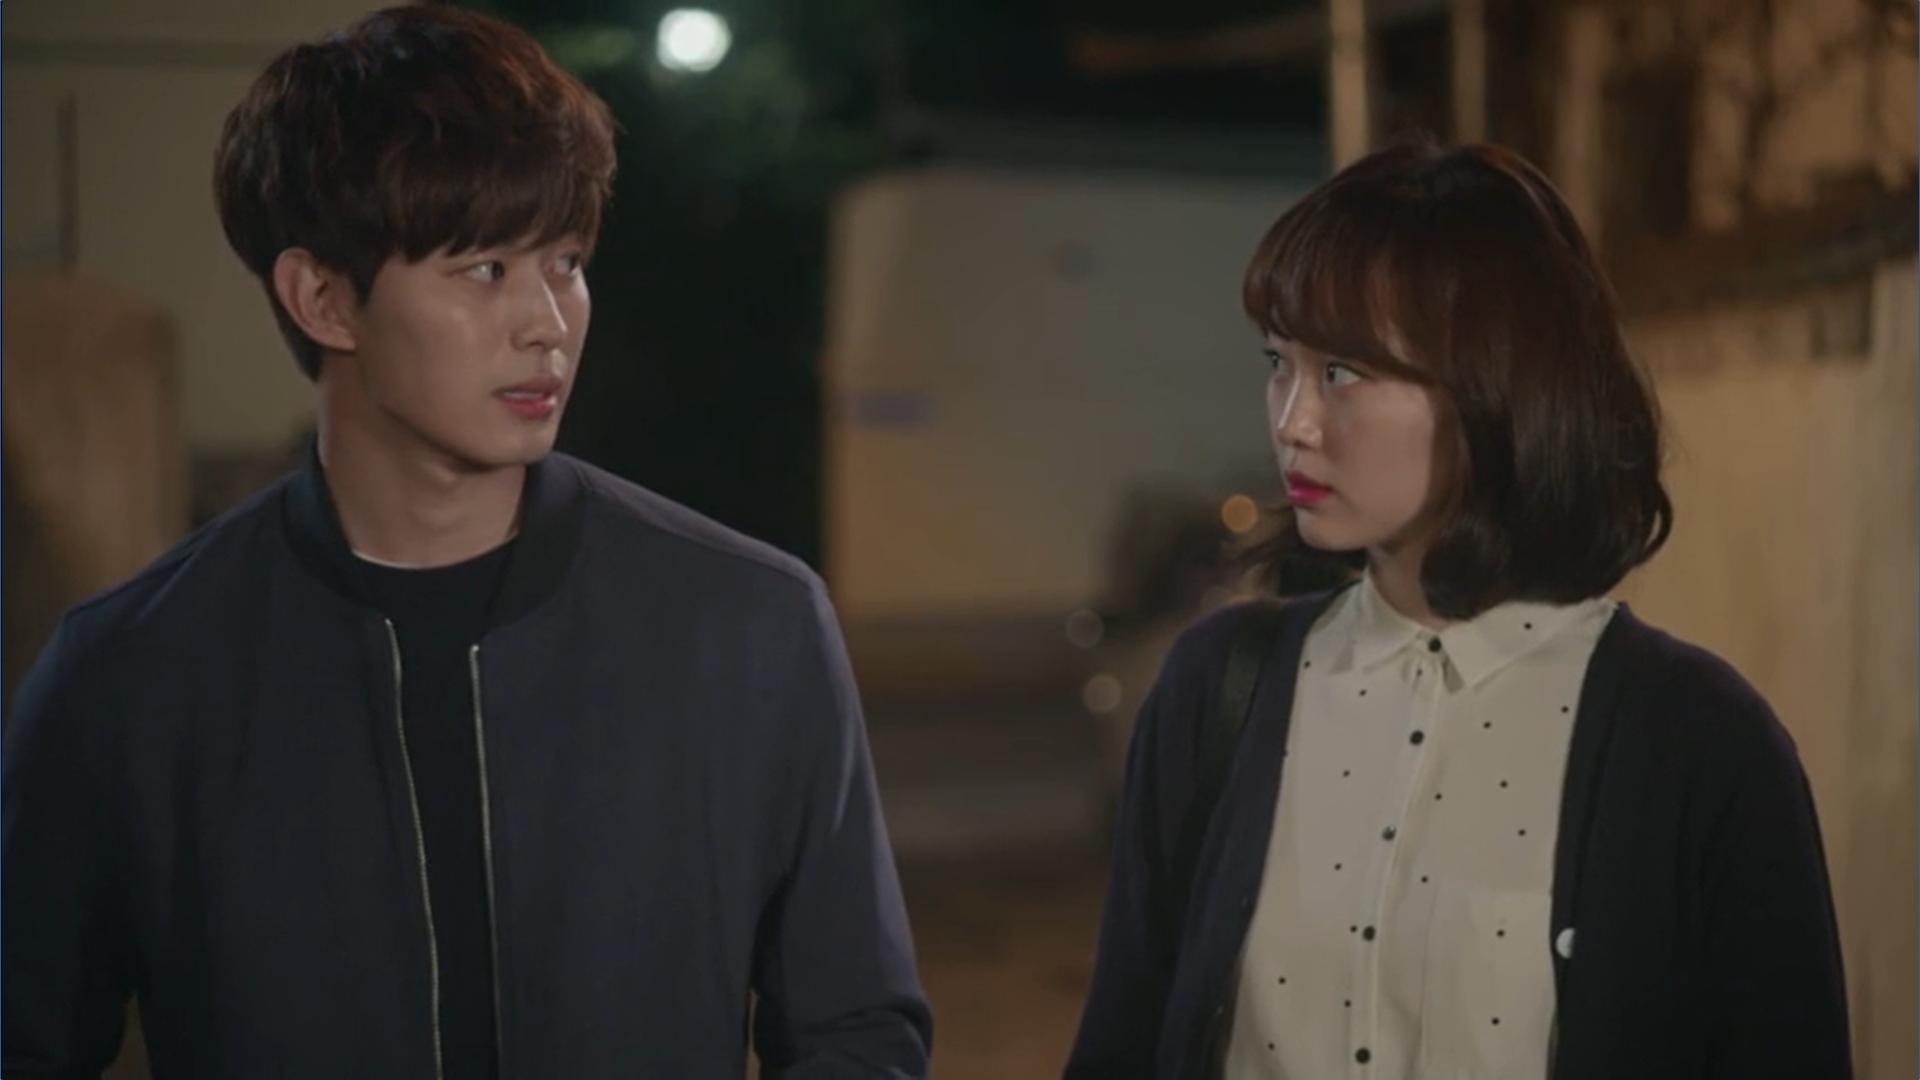 Wednesday 3:30 PM Seon Eun-woo and Yoon Jae-won walking and talking